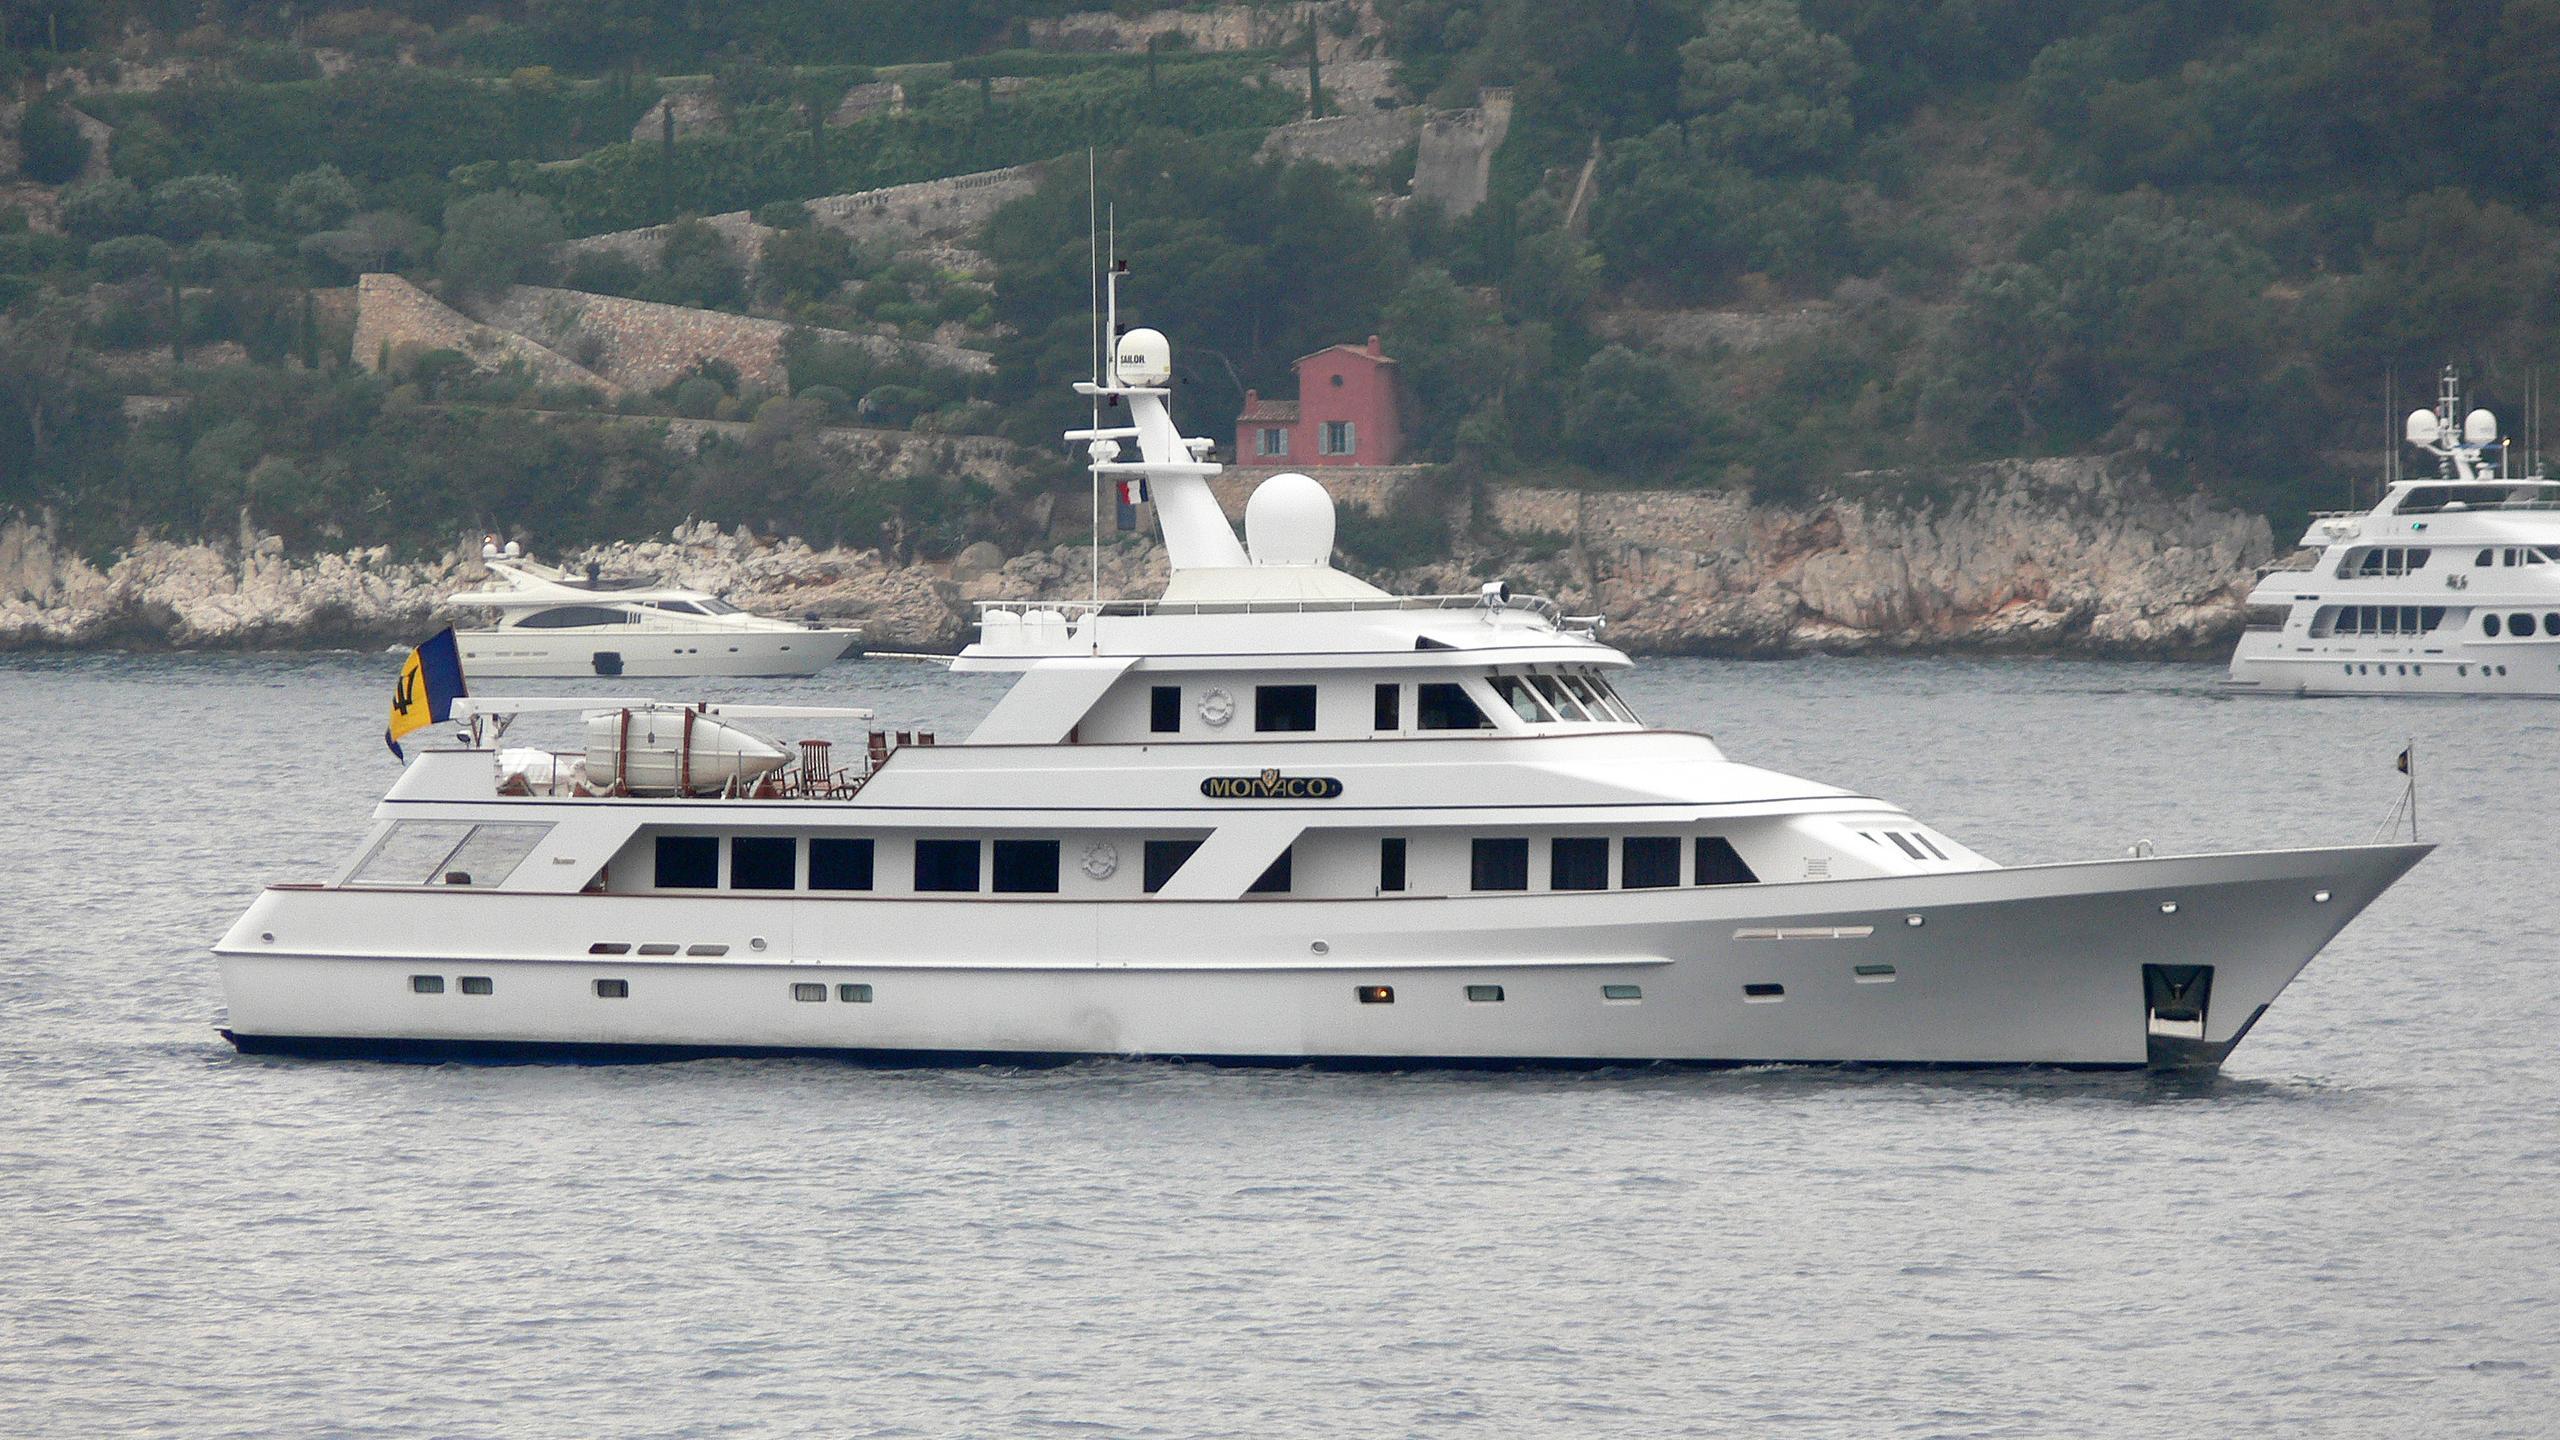 monaco-motor-yacht-feadship-1981-38m-profile